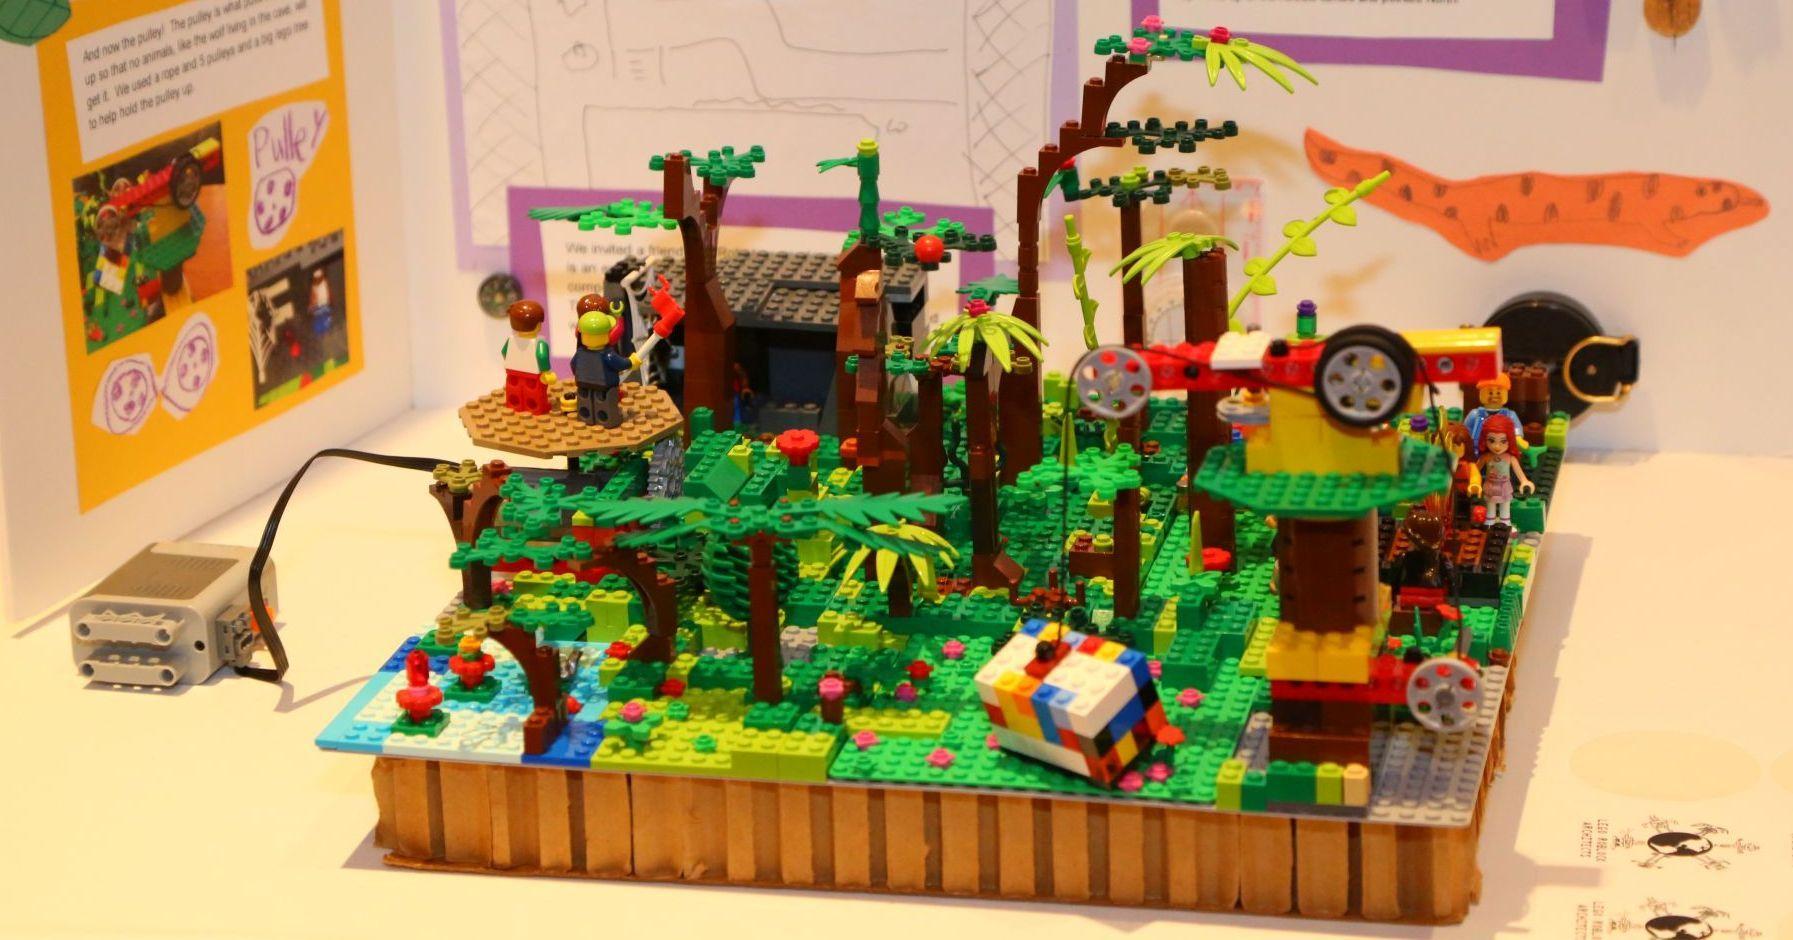 LEGO League Jr. First lego league, Lego, Activities for kids